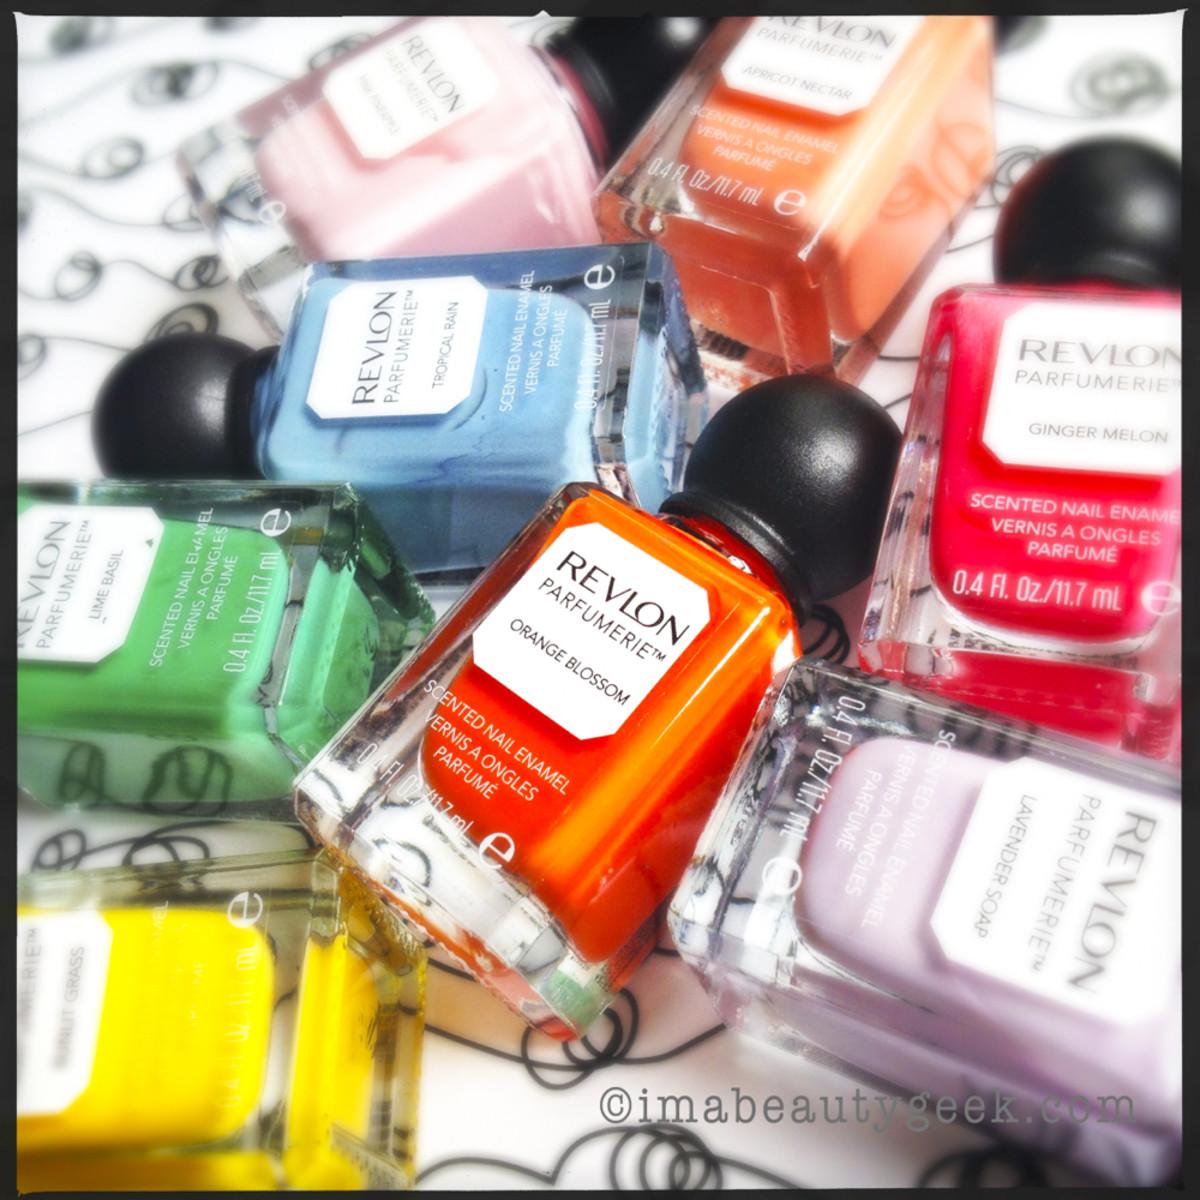 Revlon Parfumerie Spring 2014